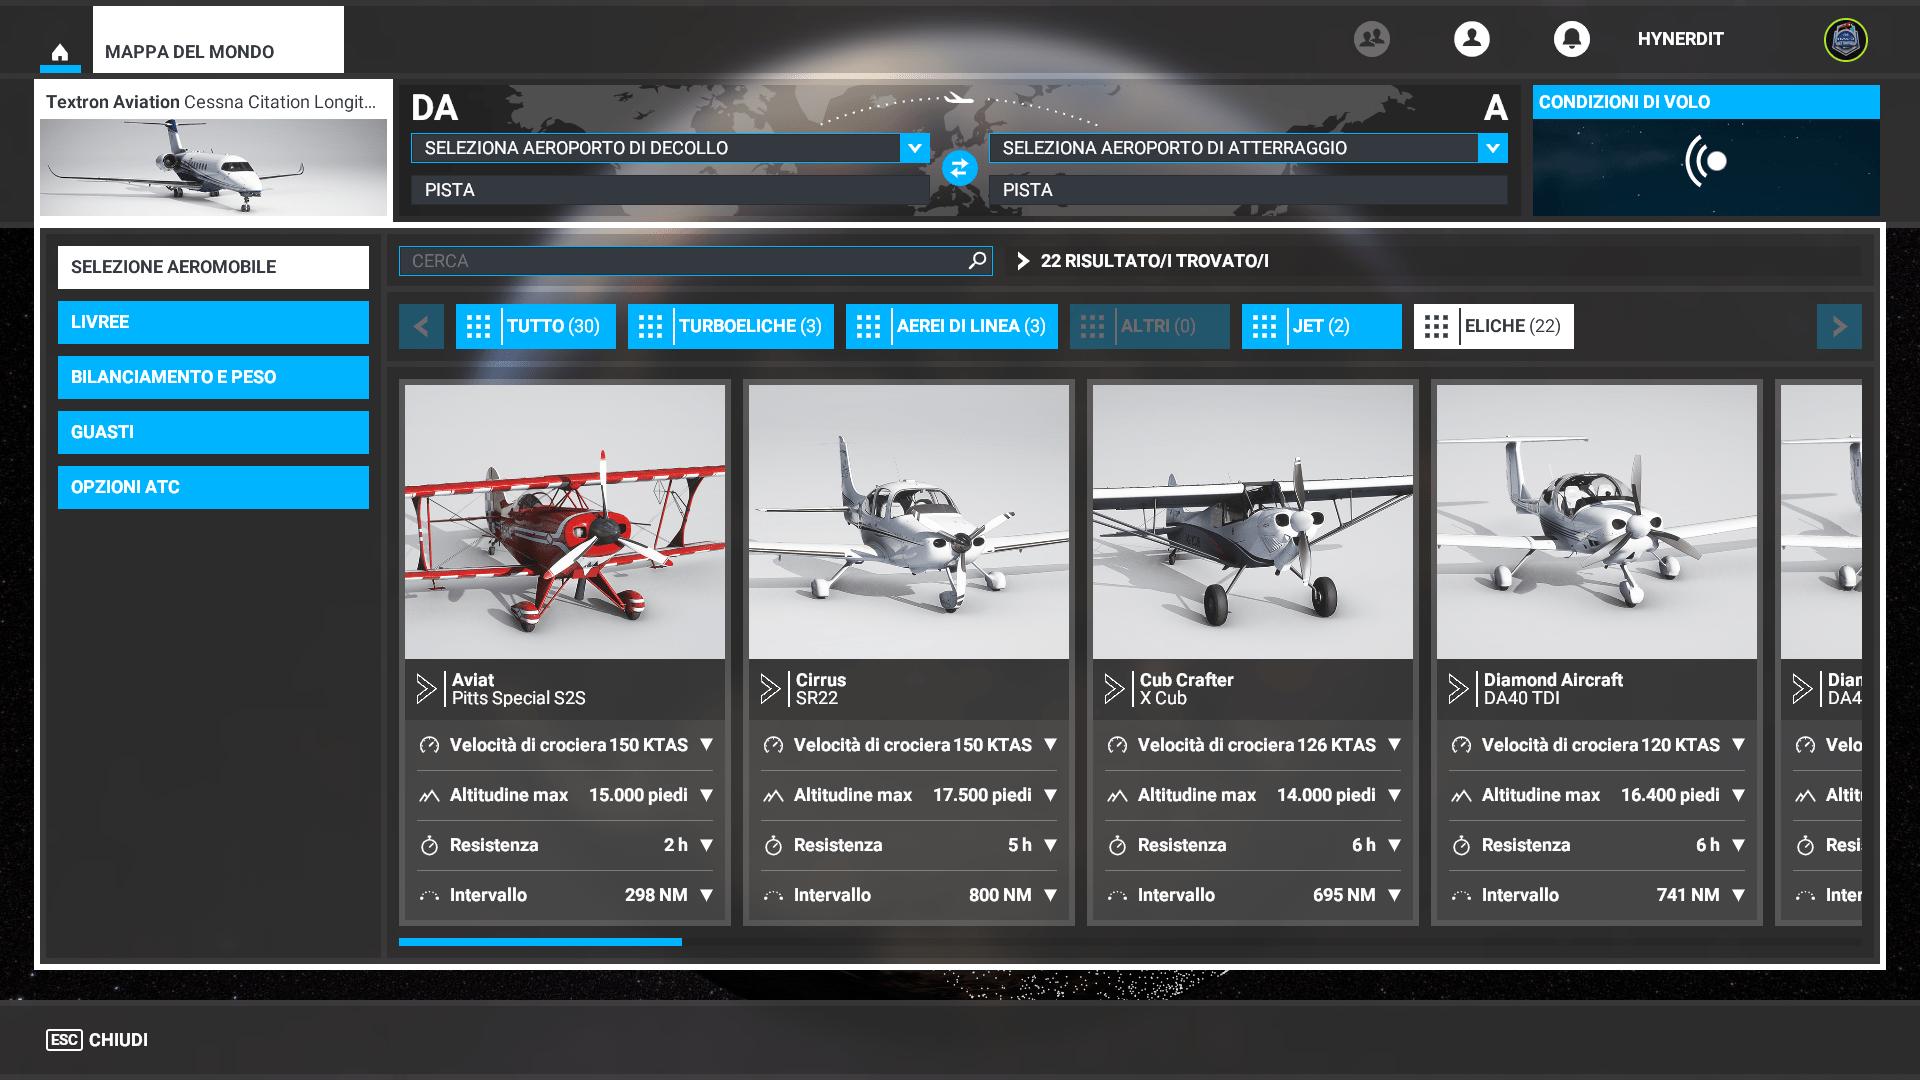 Microsoft Flight Simulator 2020: La Recensione 9 - Hynerd.it